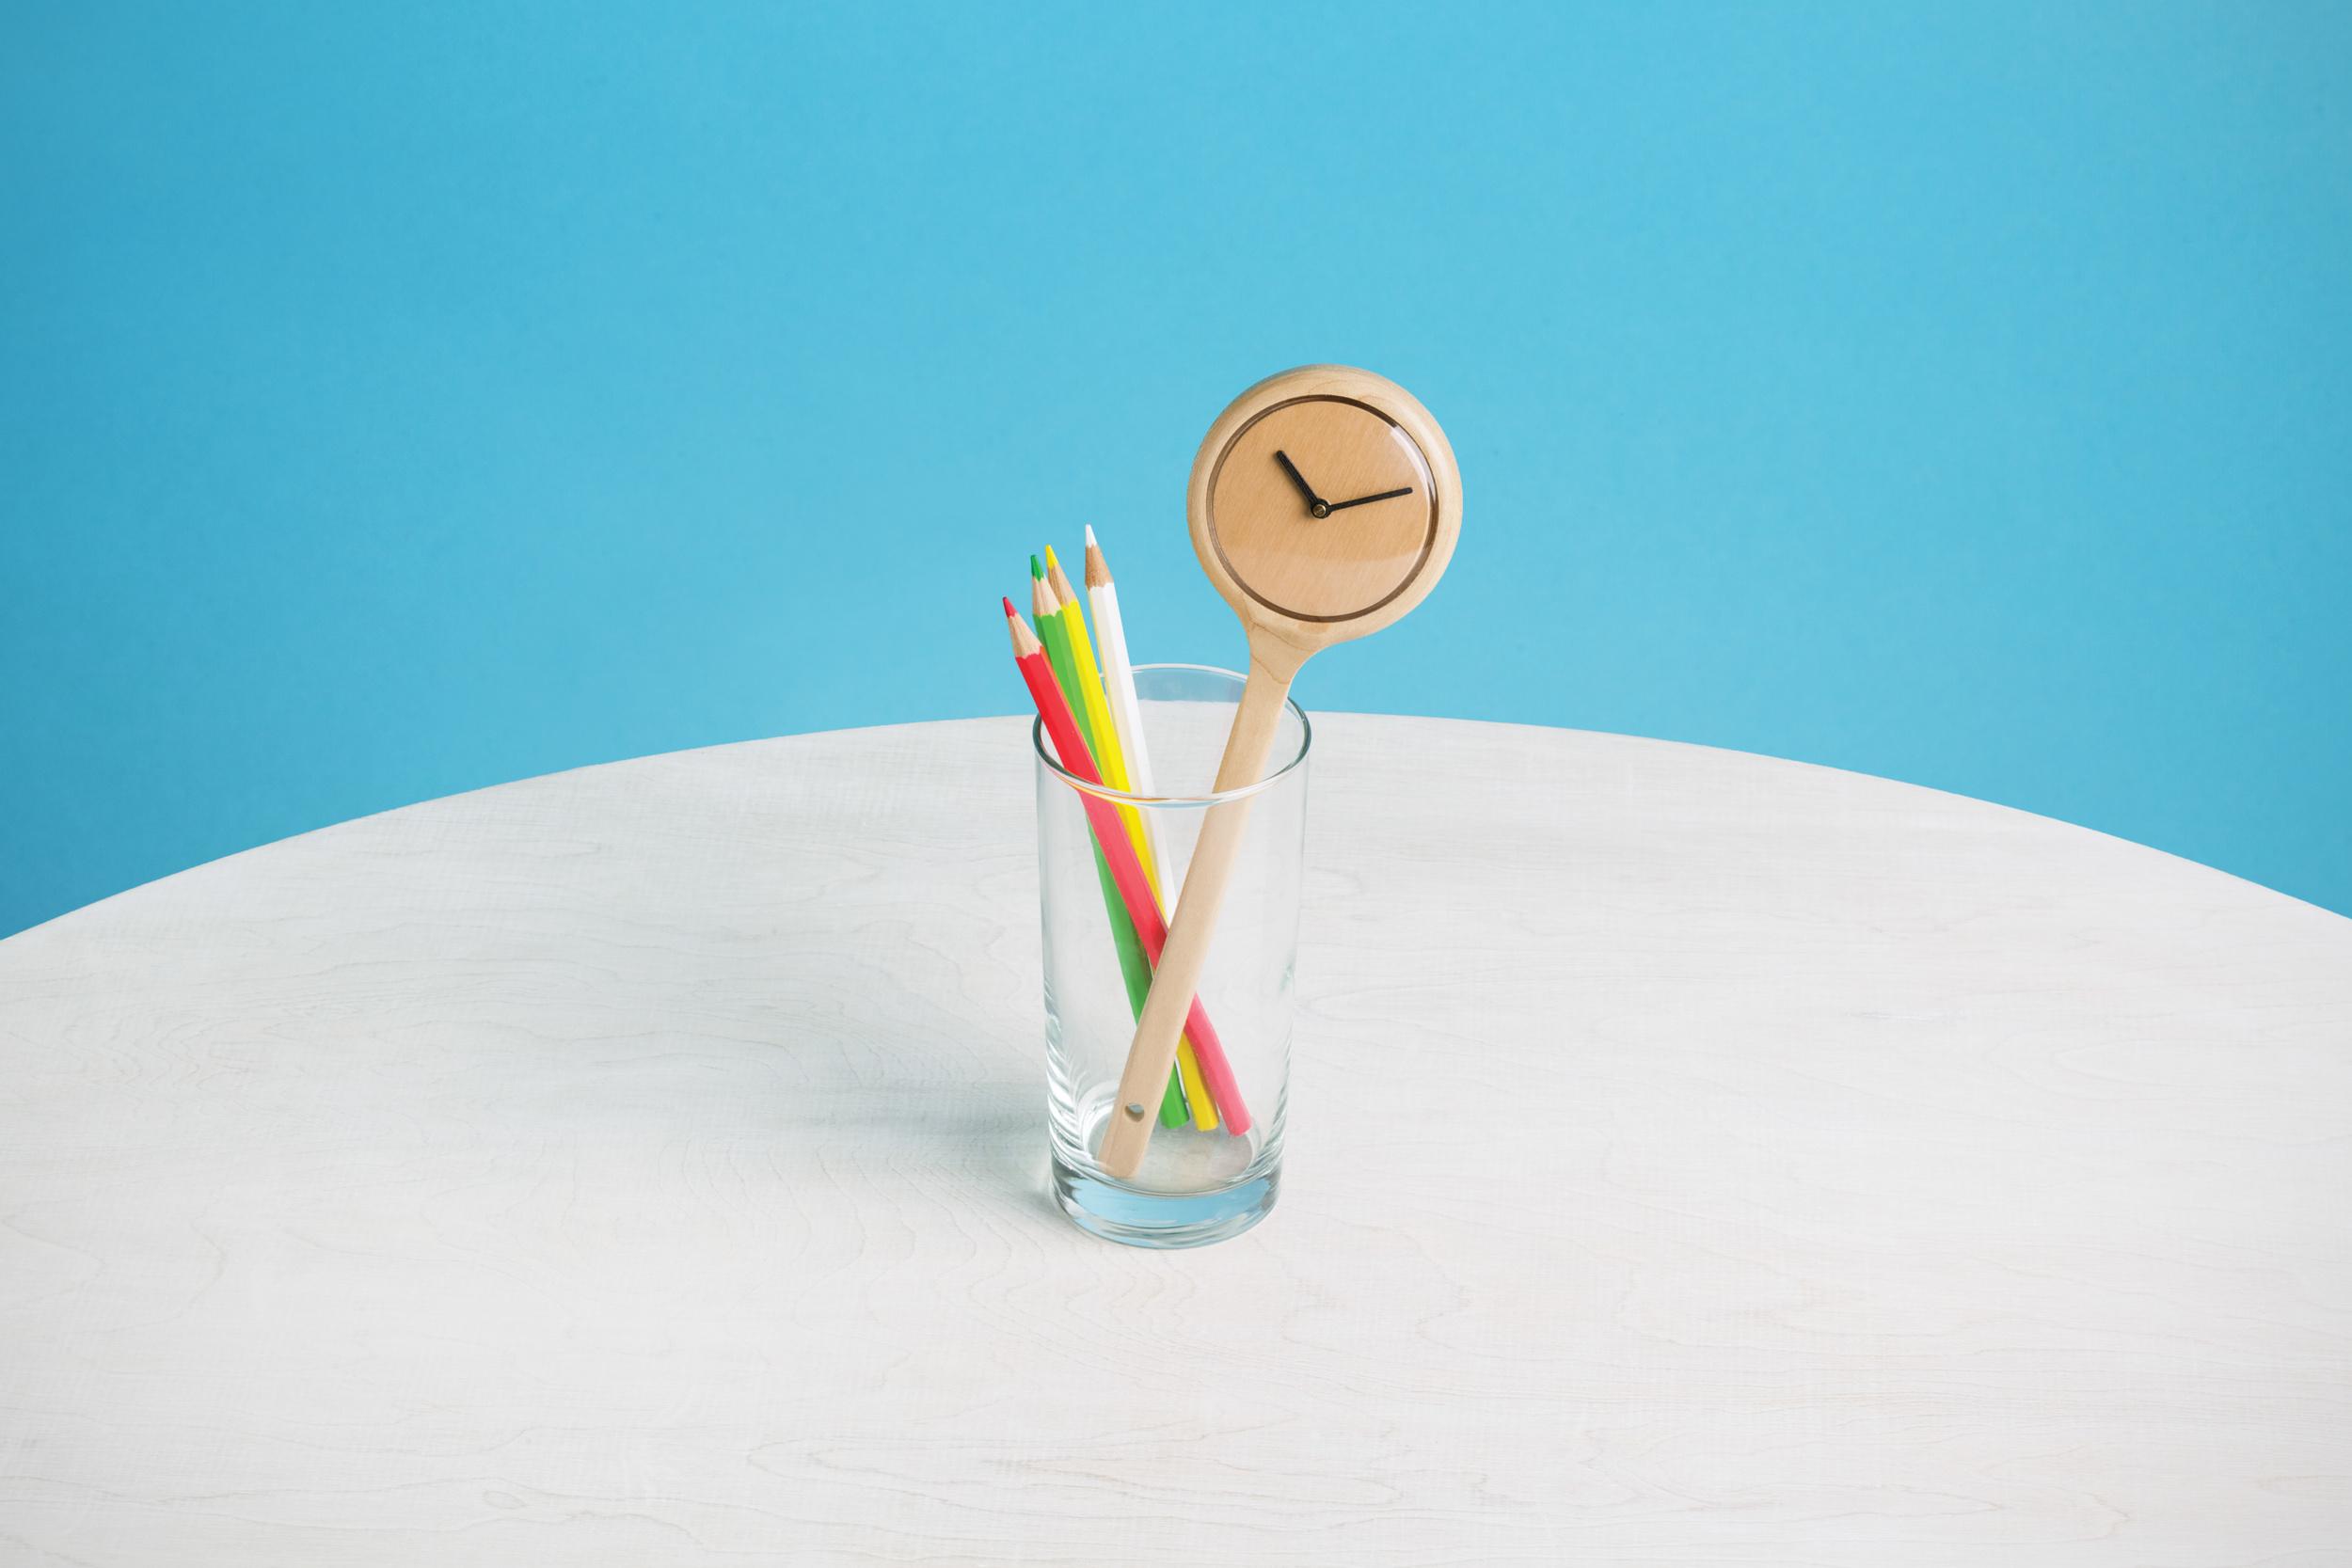 880250-390_Spoon-Clock_Natural_1.jpg